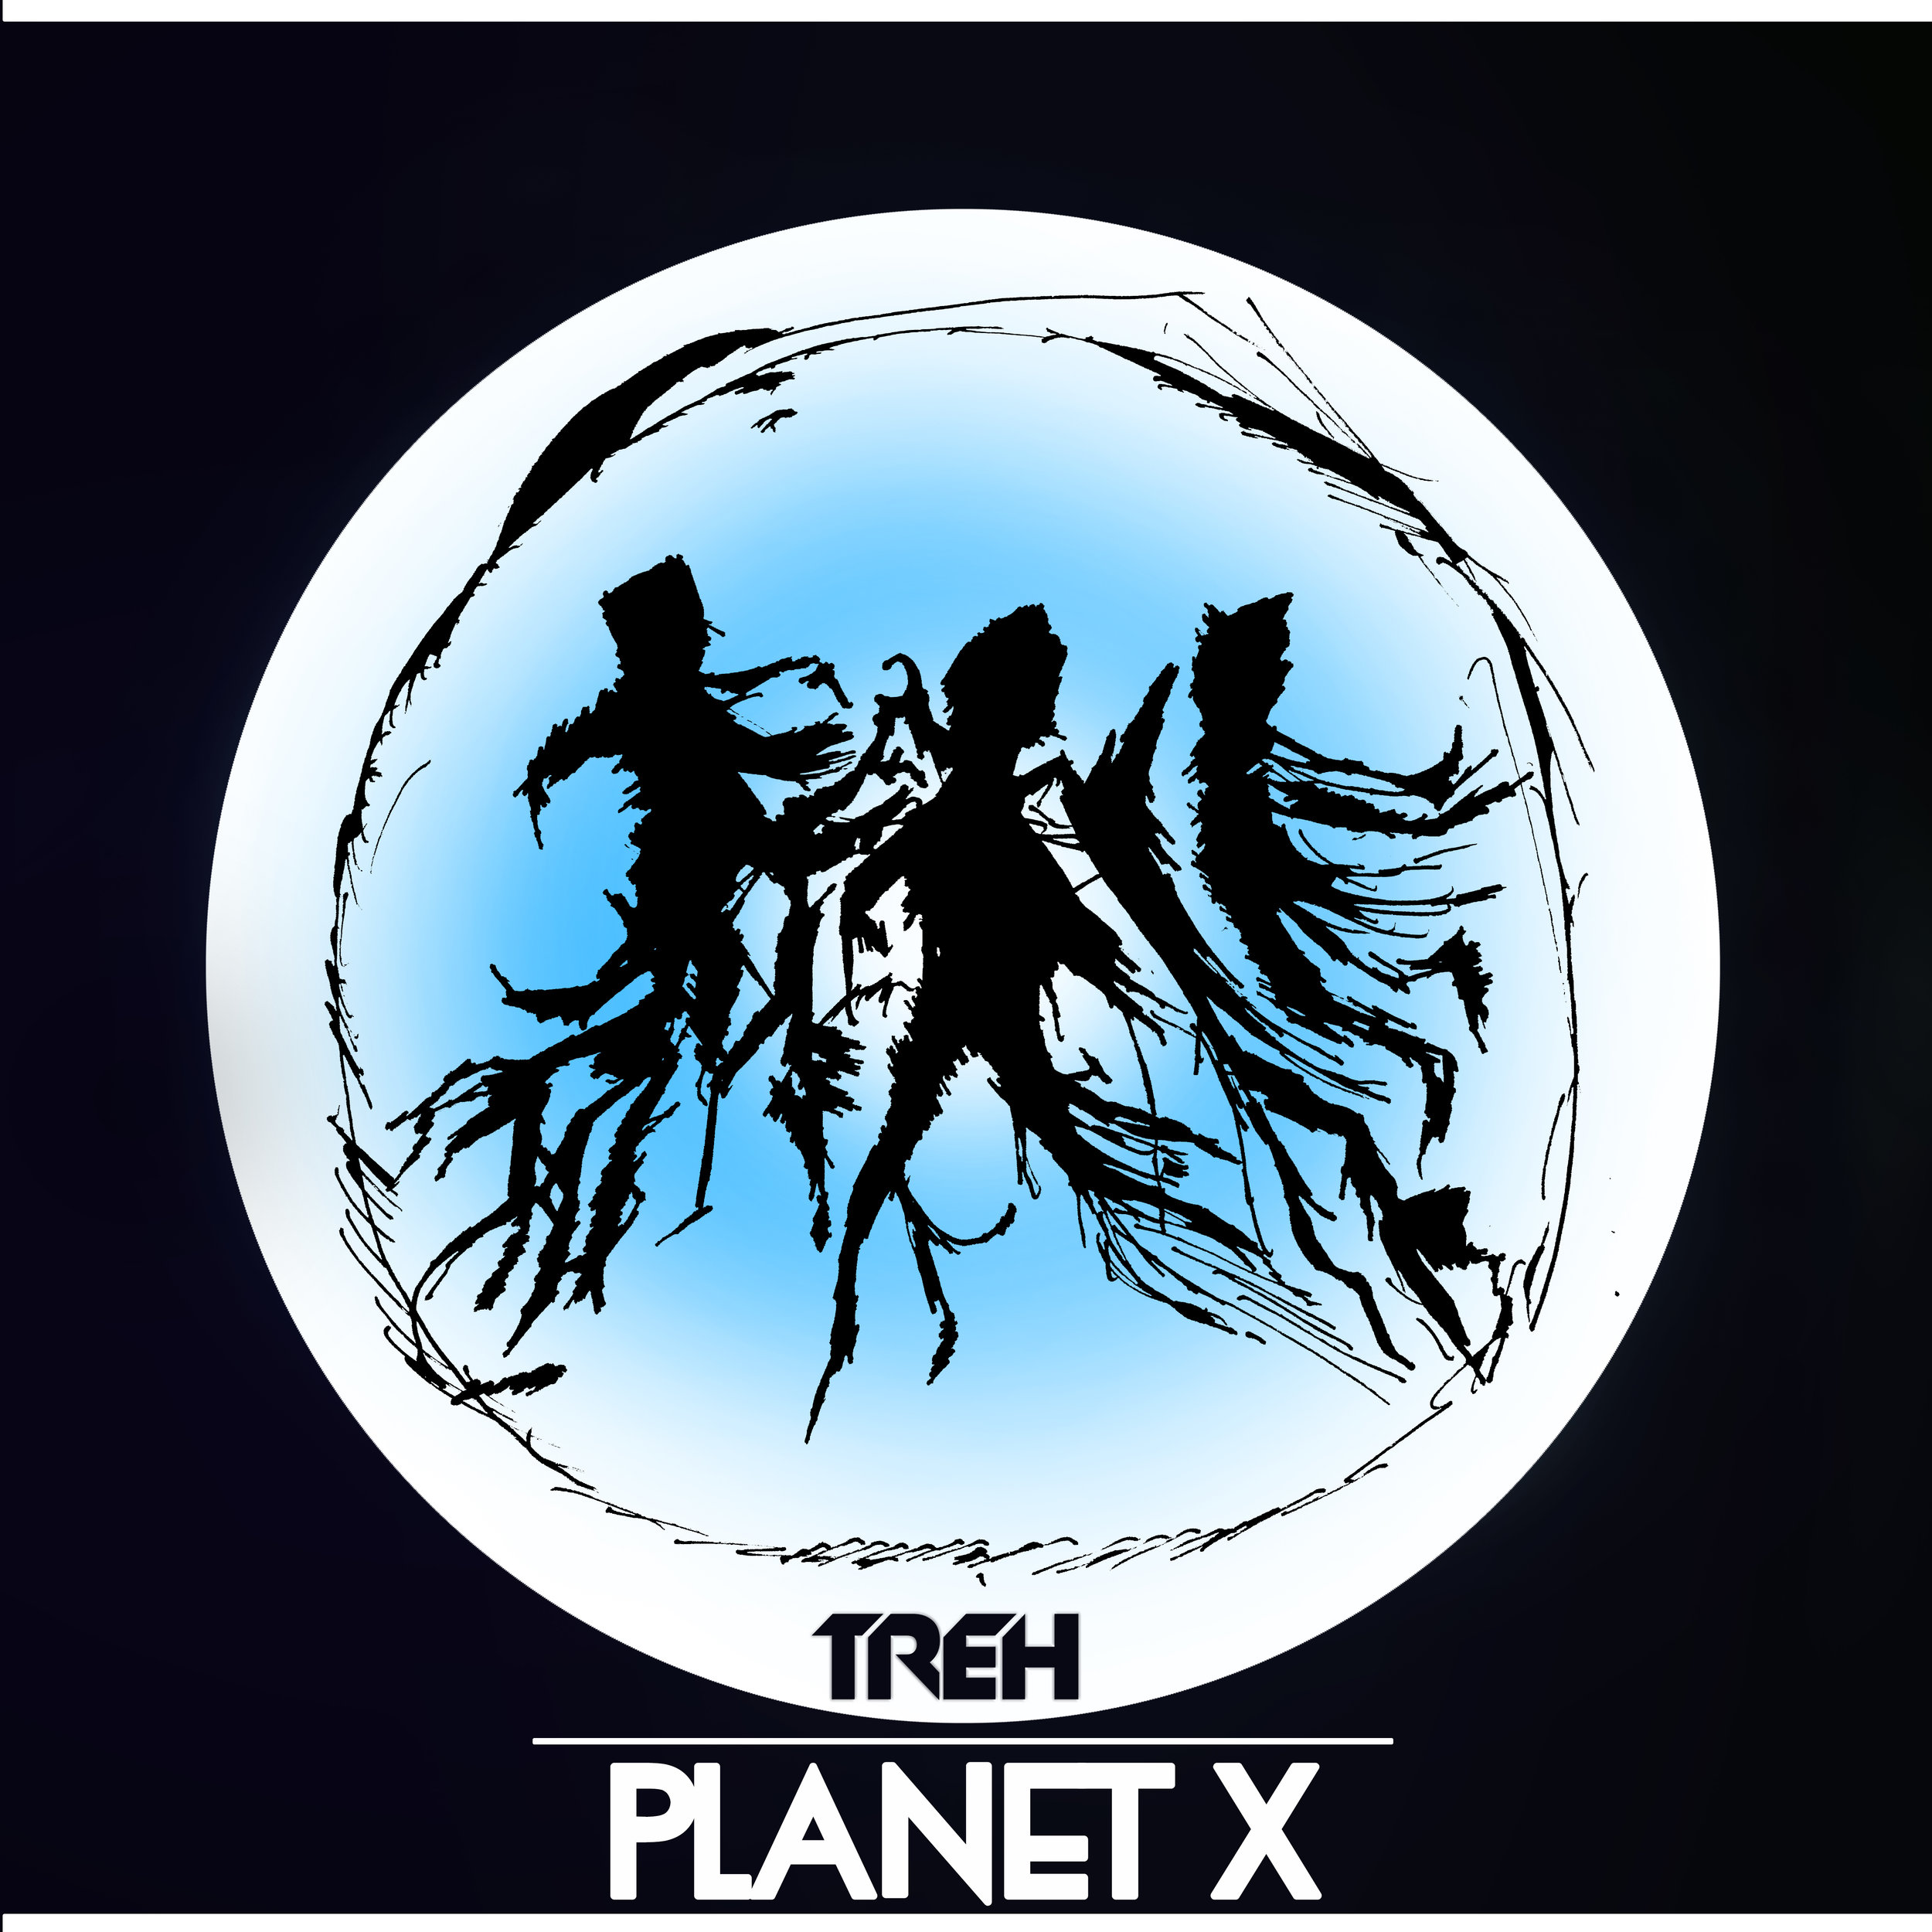 TREH---Planet-X.jpg